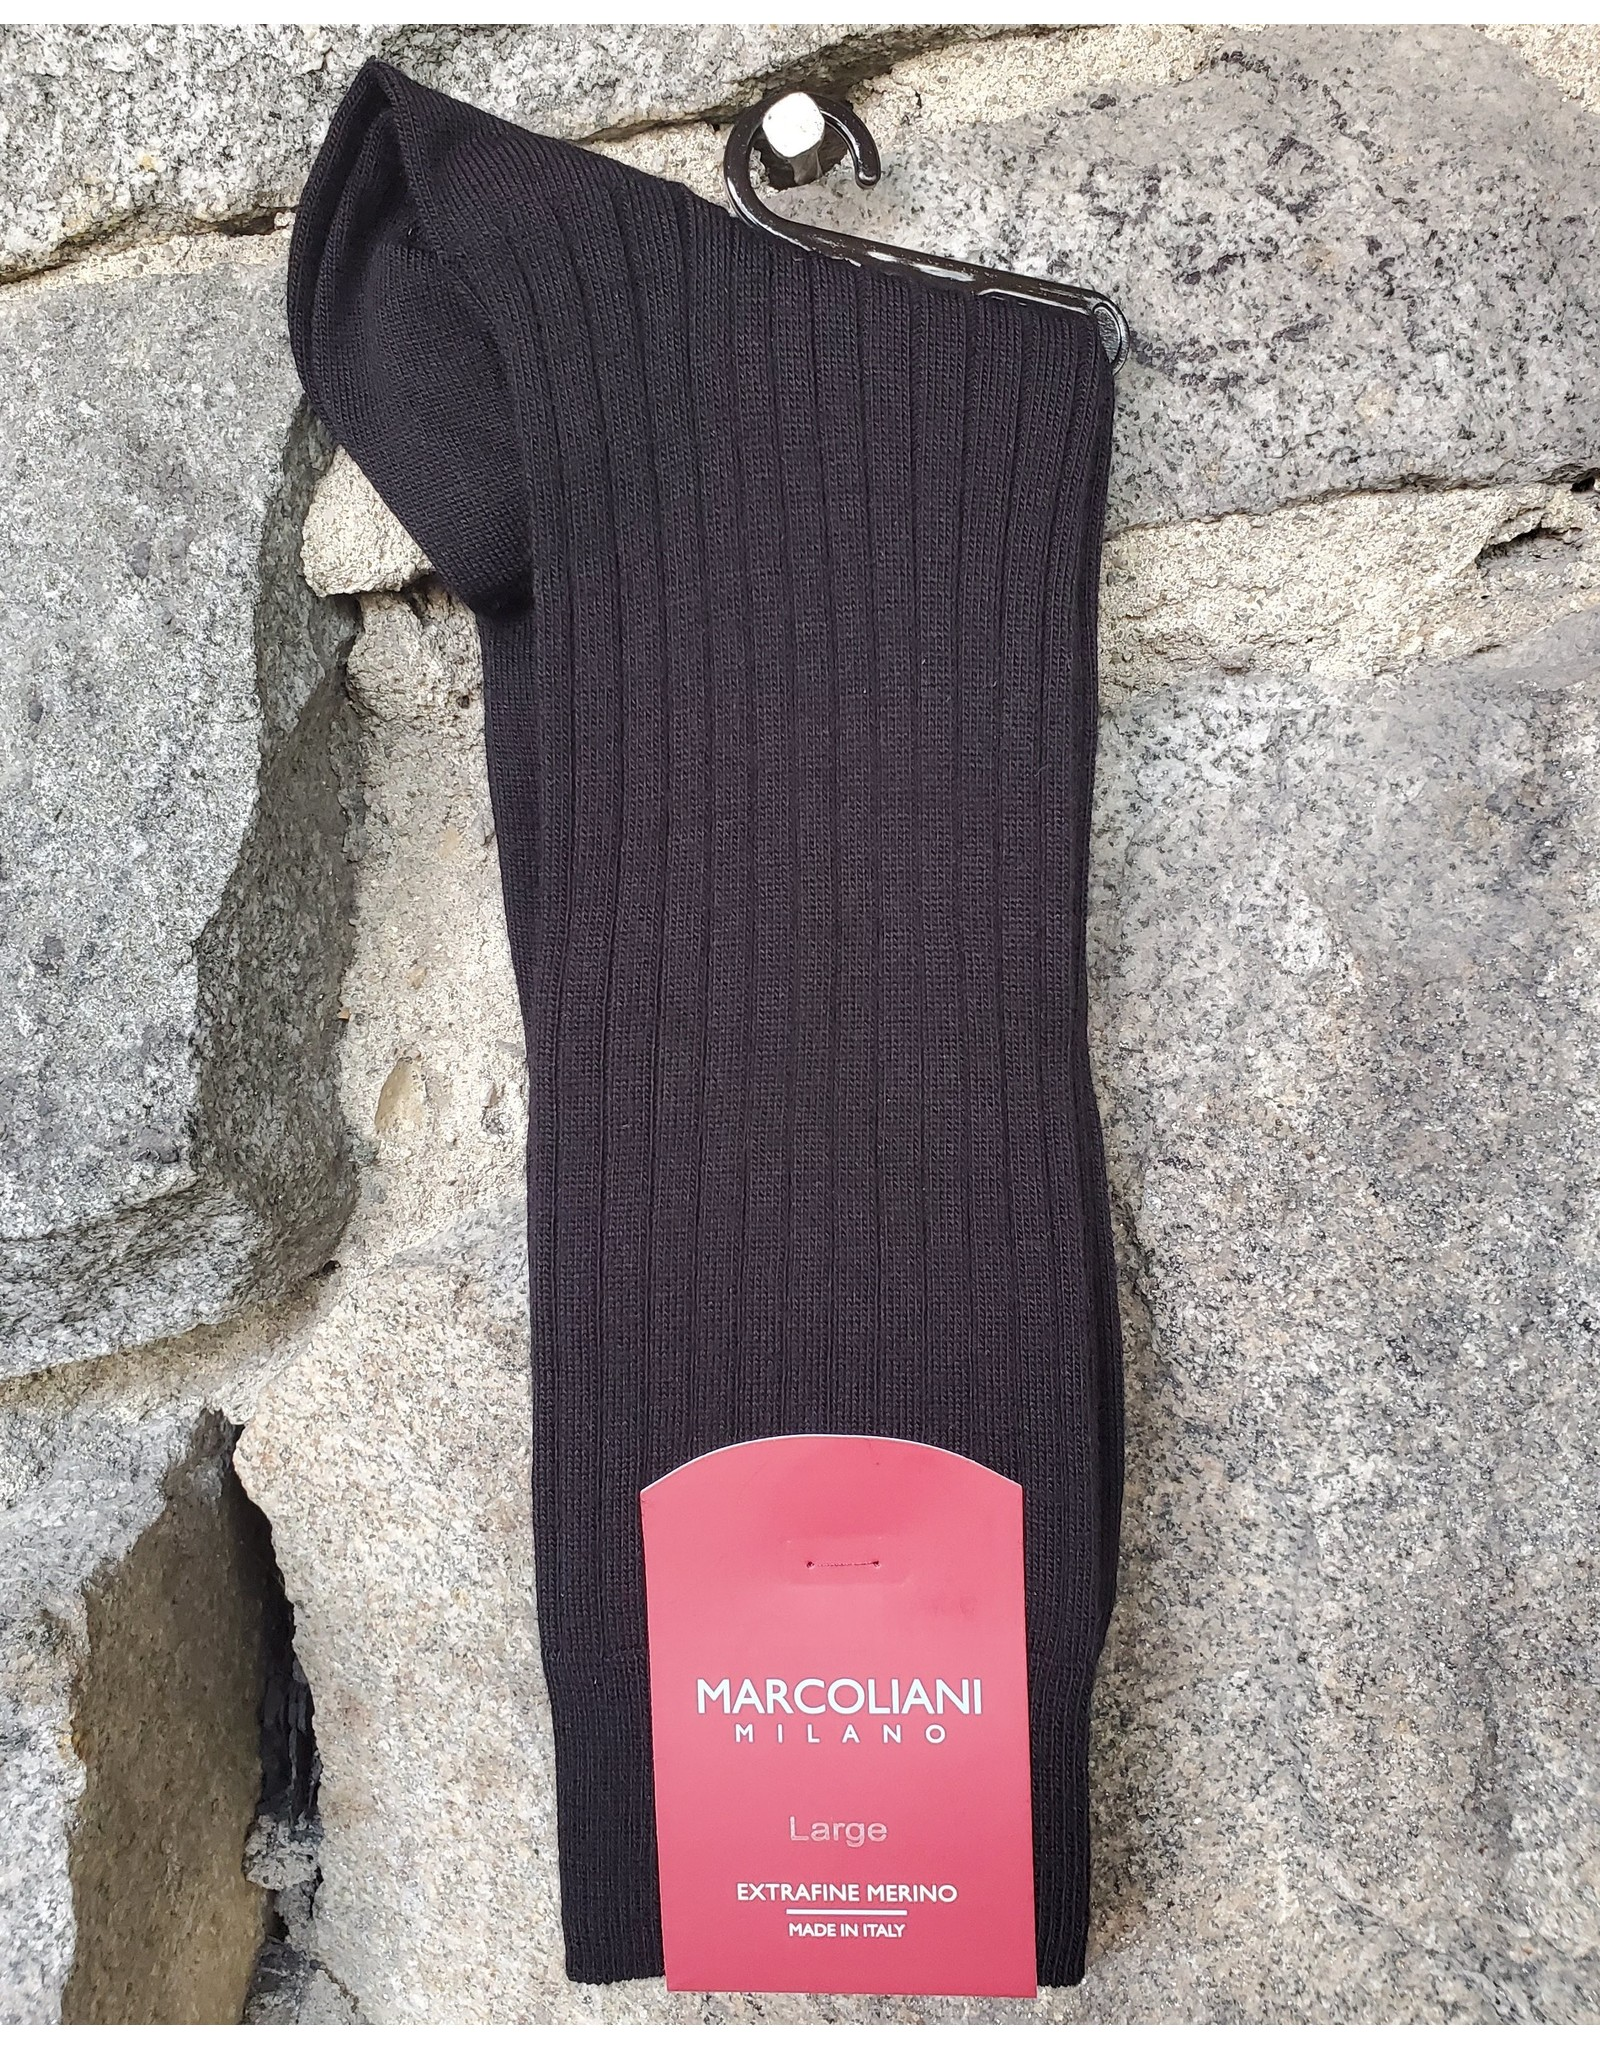 Marcoliani Marcoliani LARGE Extrafine Merino Socks - Black Ribbed Dress